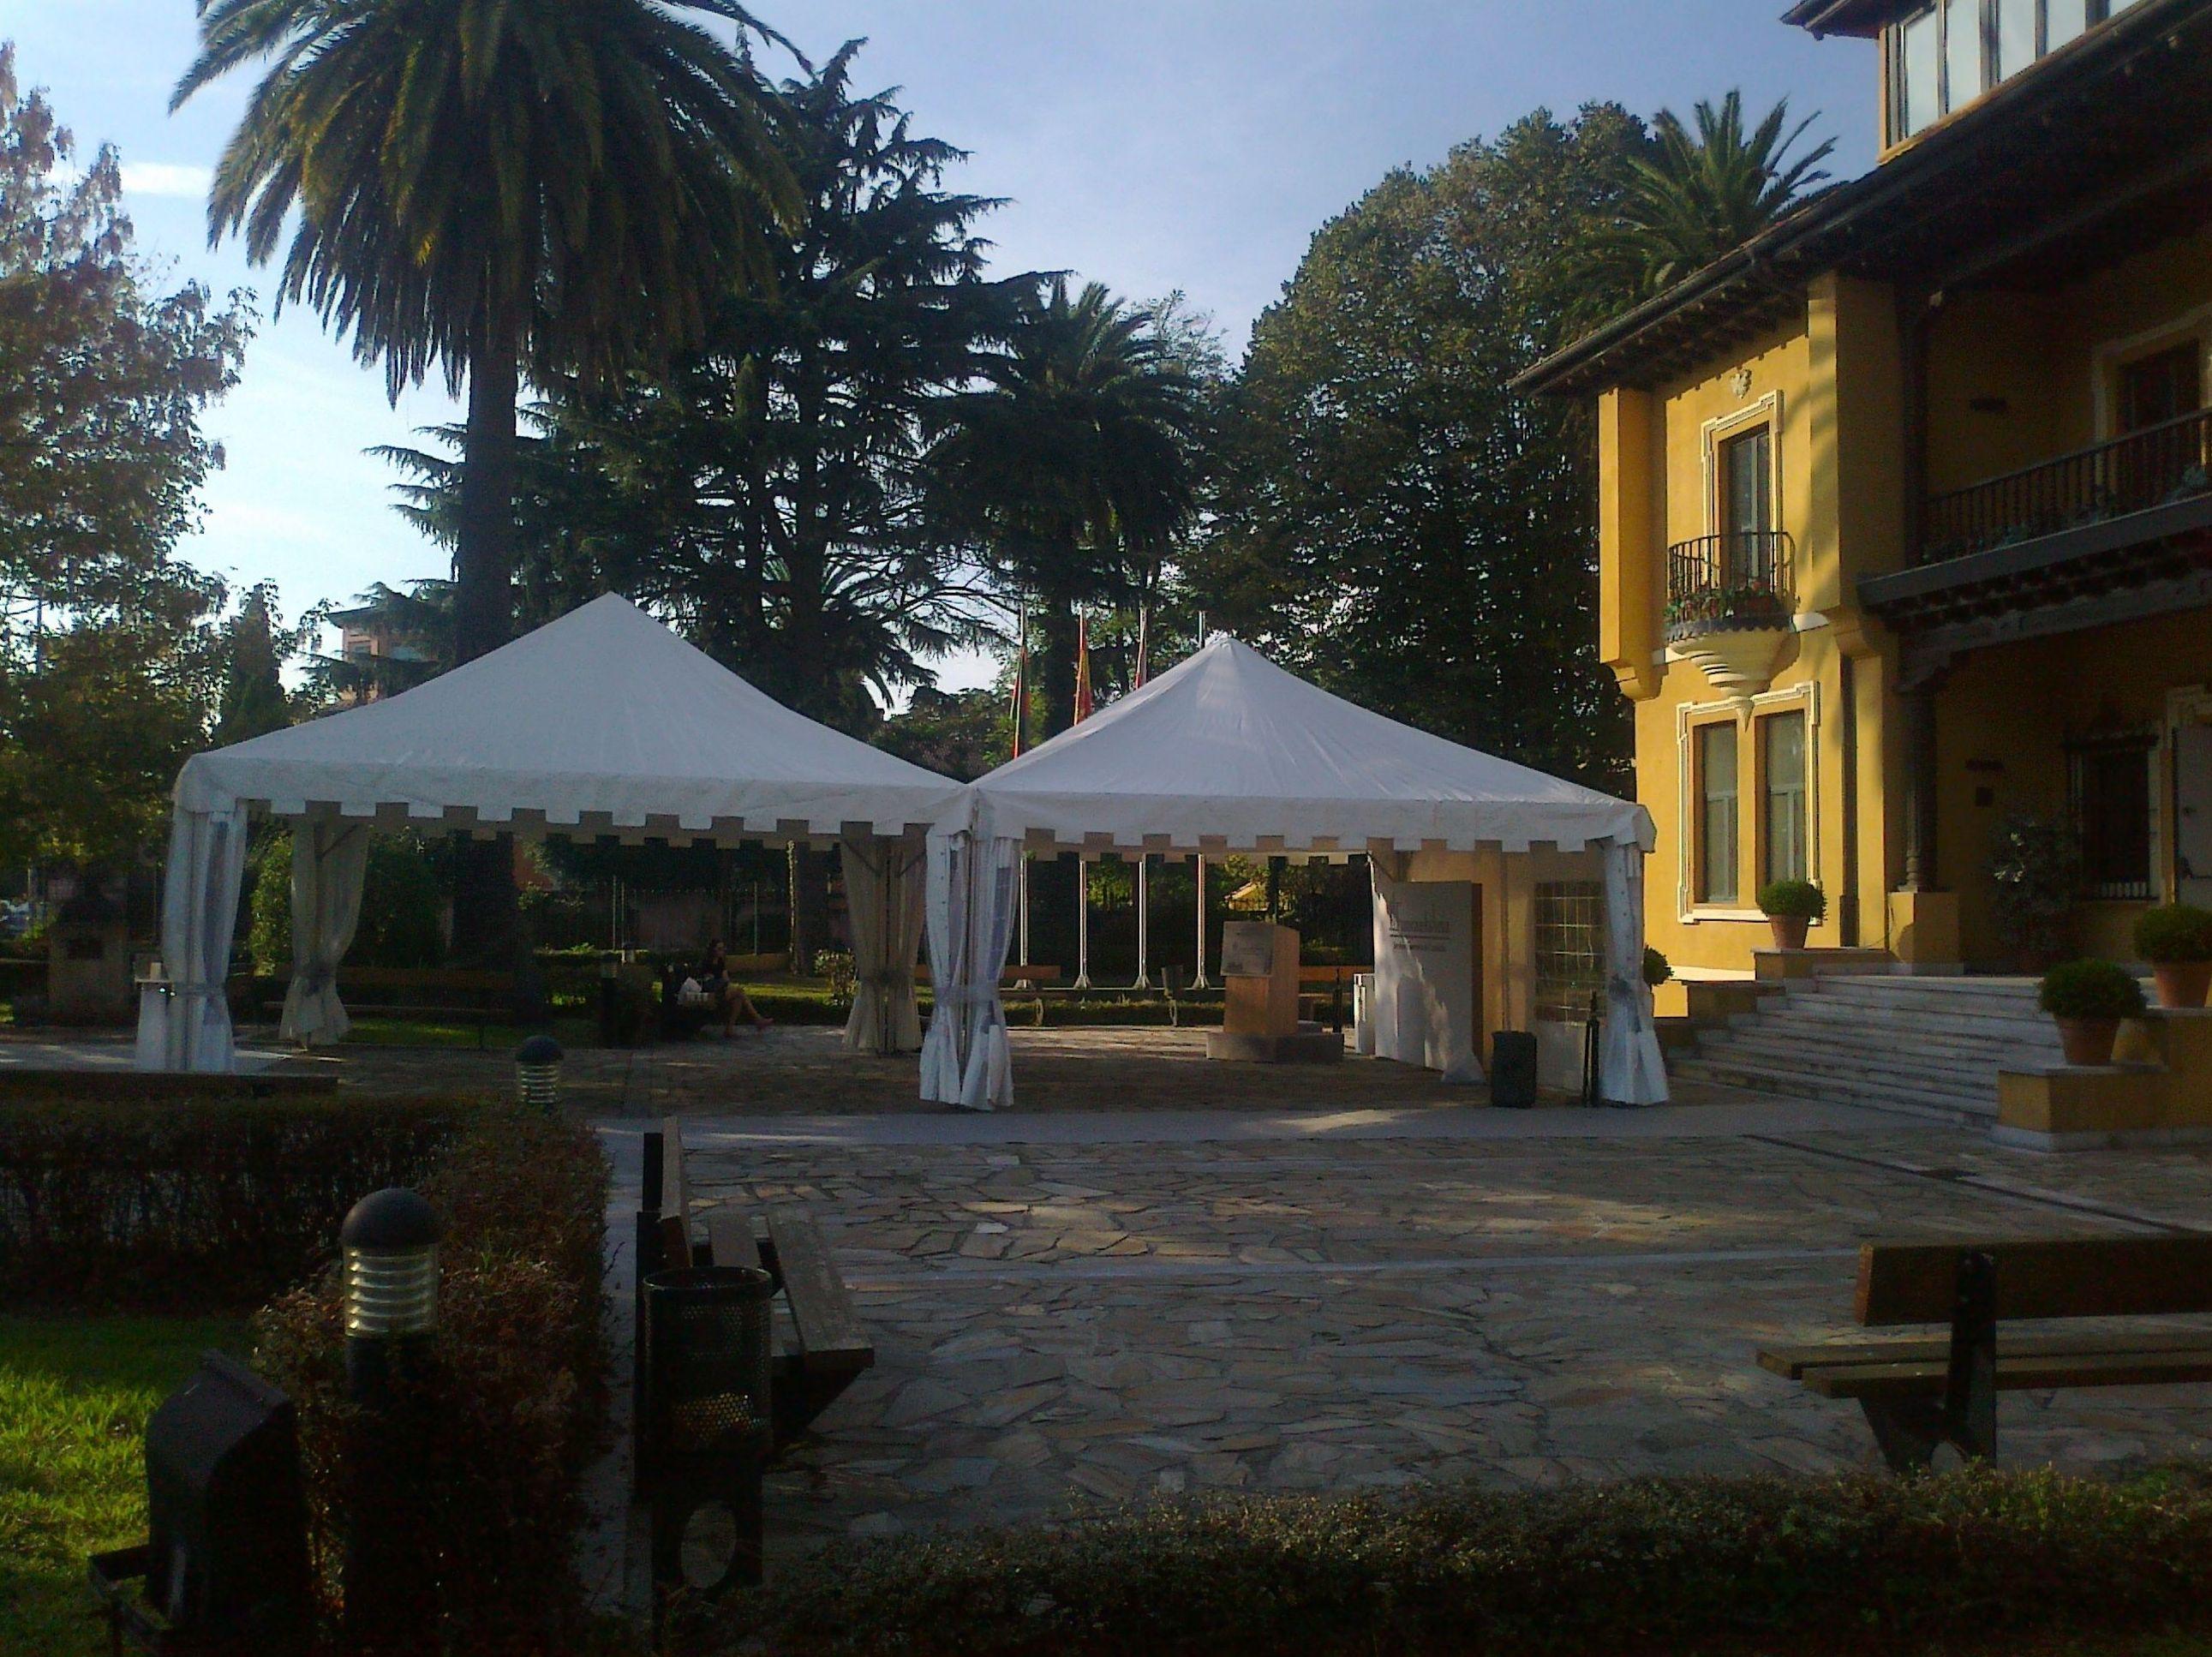 Venta de carpas para eventos en Cantabria